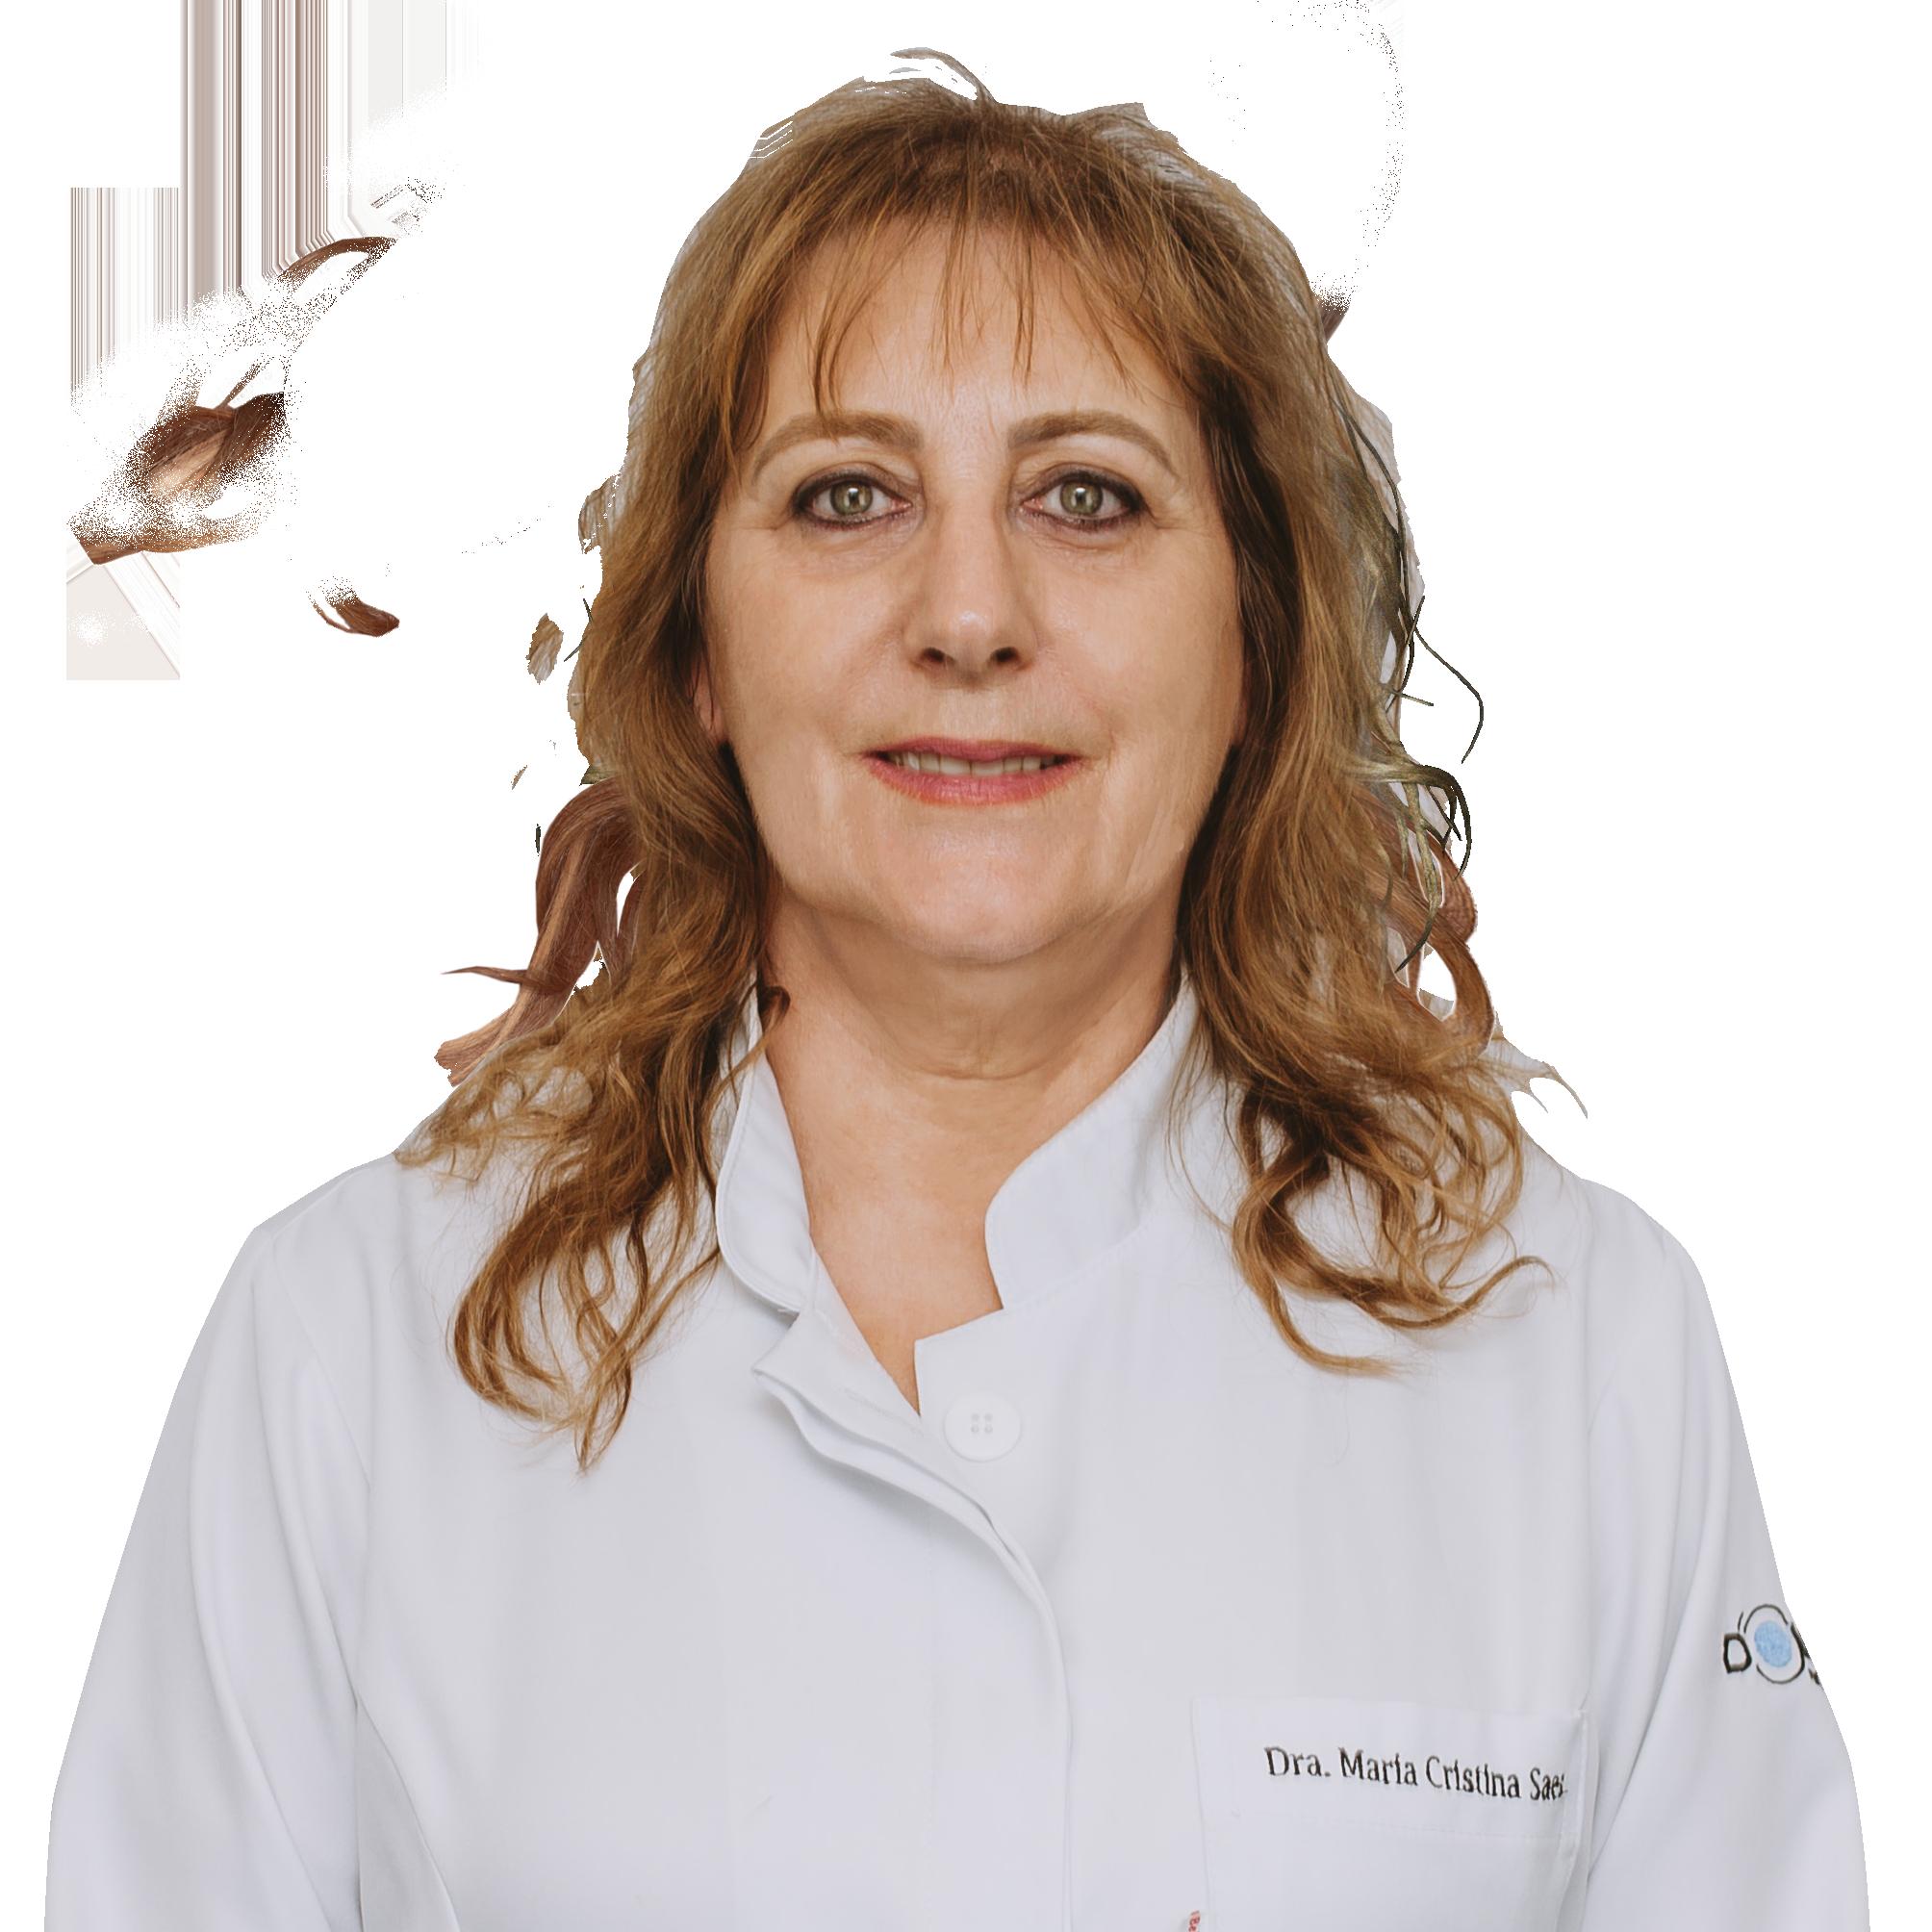 Dra. Maria Cristina Saes - D'Olhos Hospital Dia